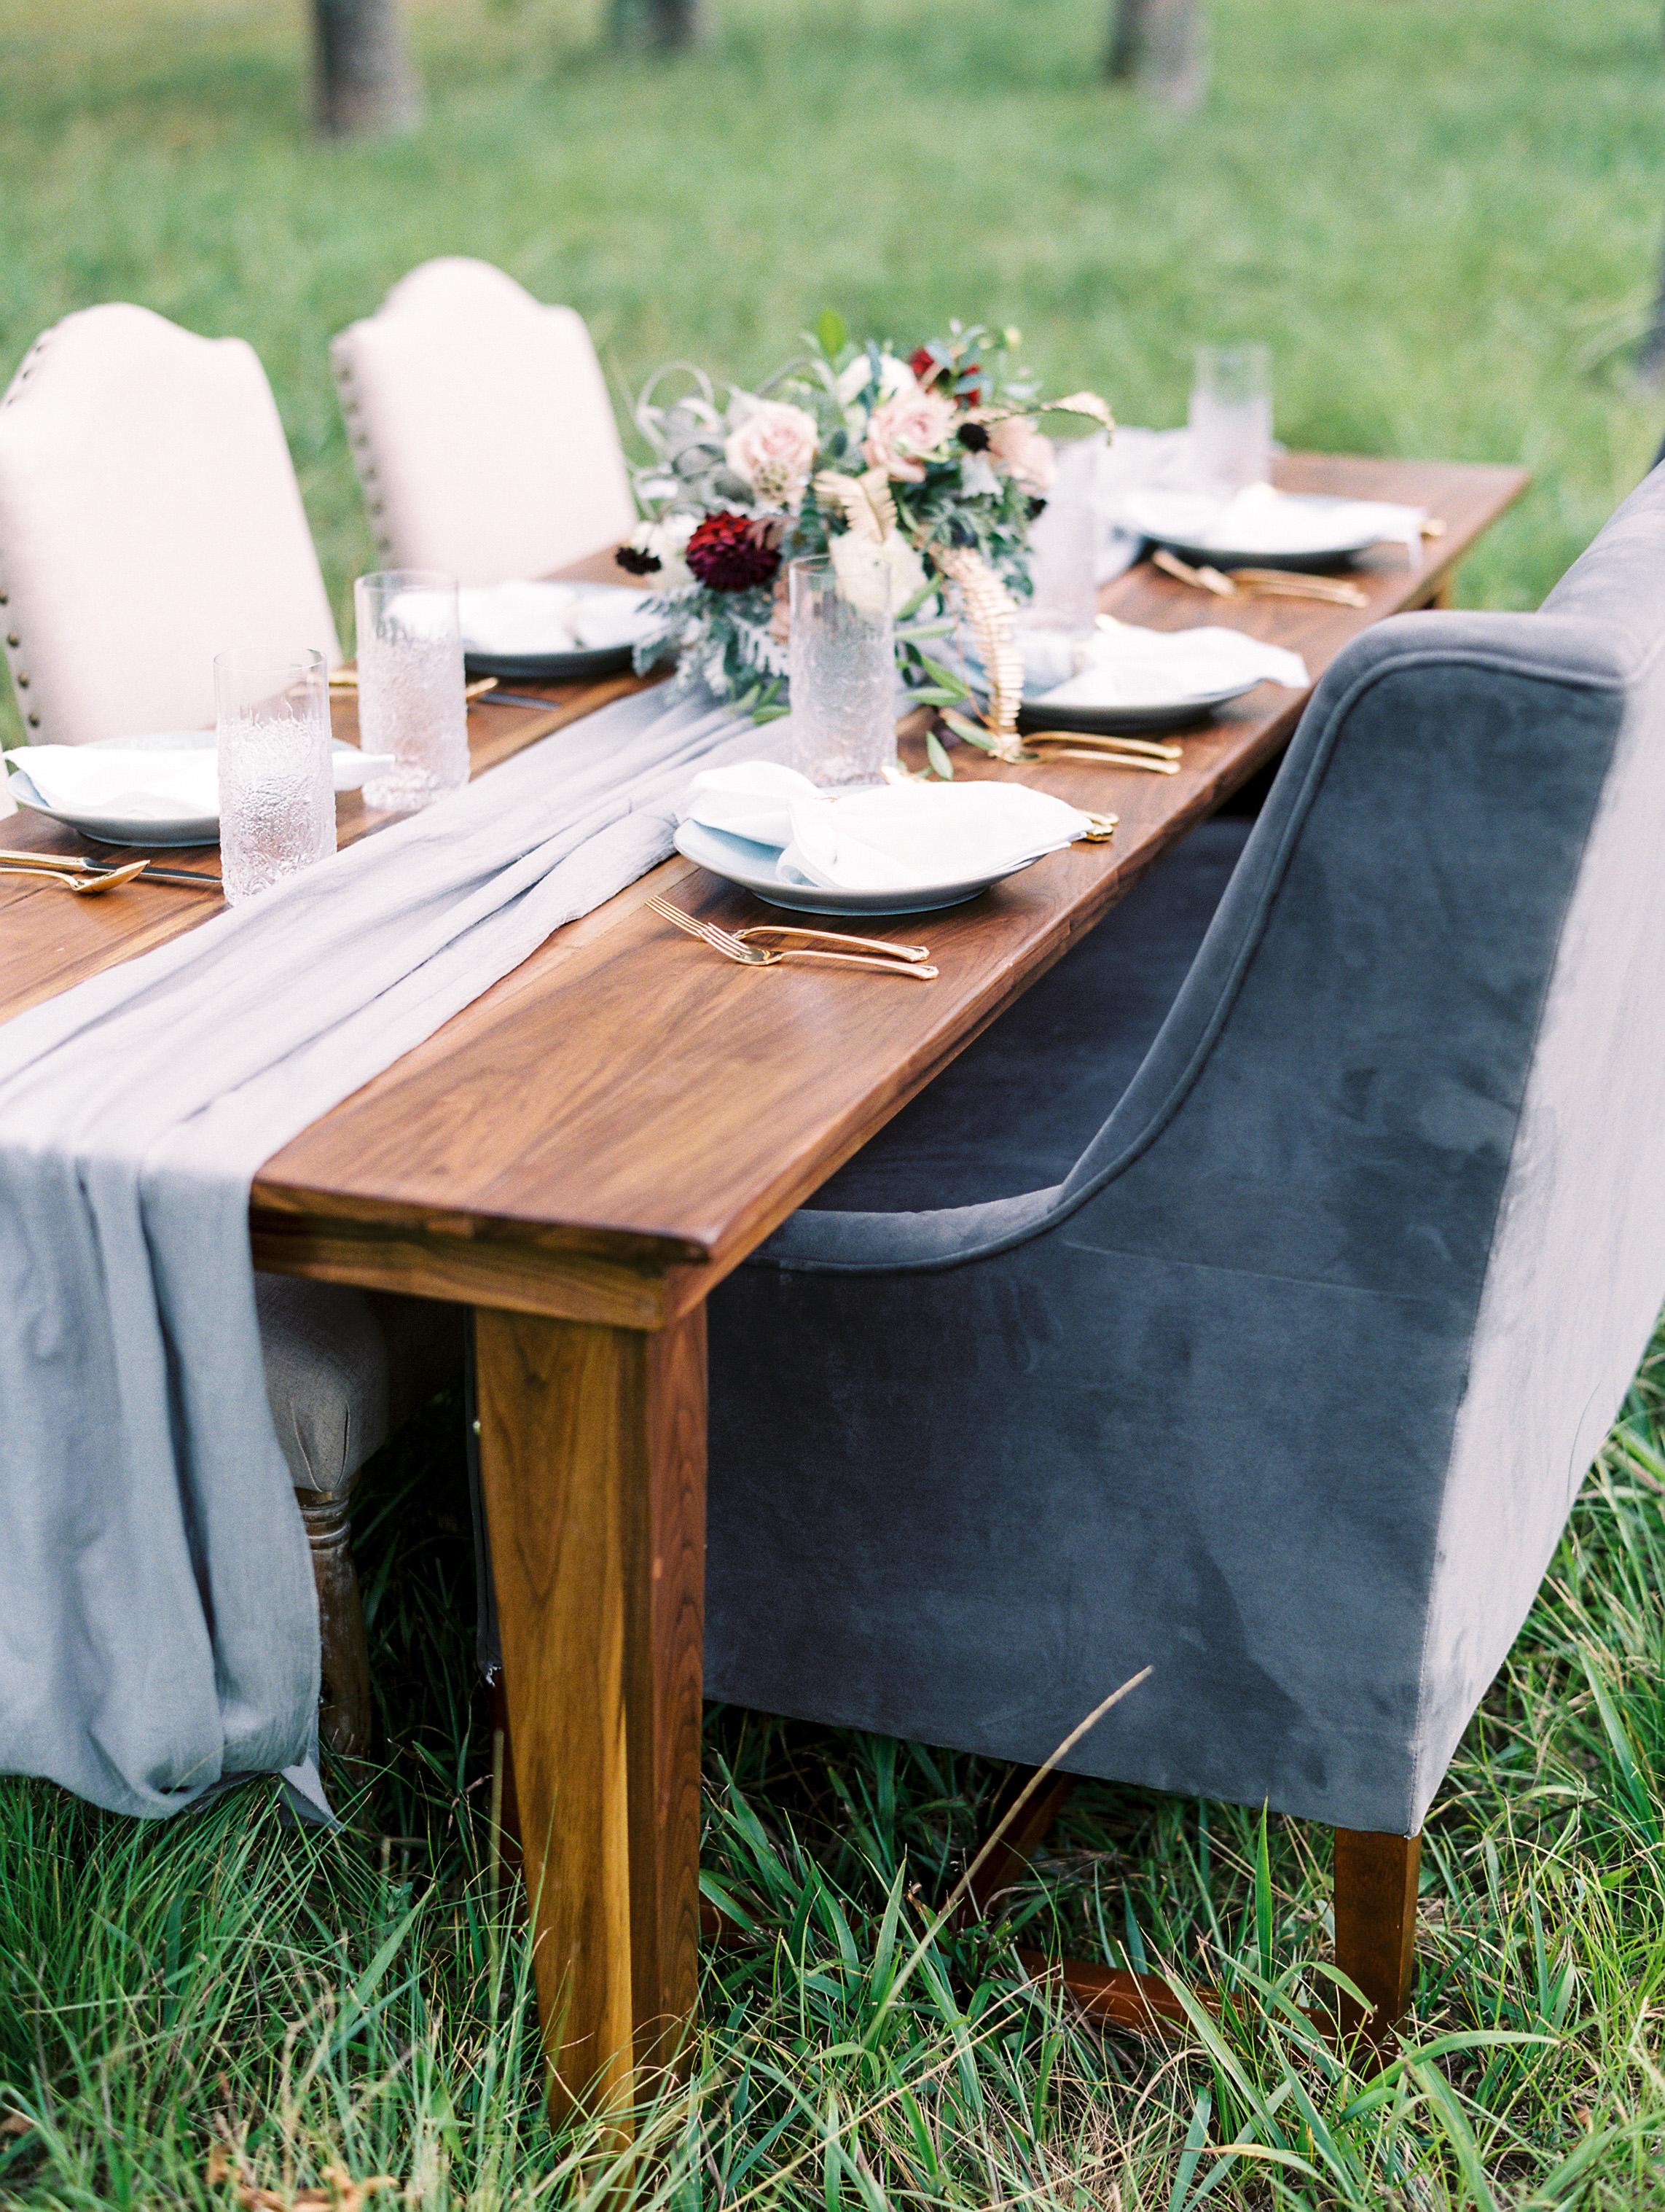 Dana-Fernandez-Photography-Houston-Wedding-Photographer-Film-100-Layer-Cake-Wedding-Inspiration-Destination-7.jpg